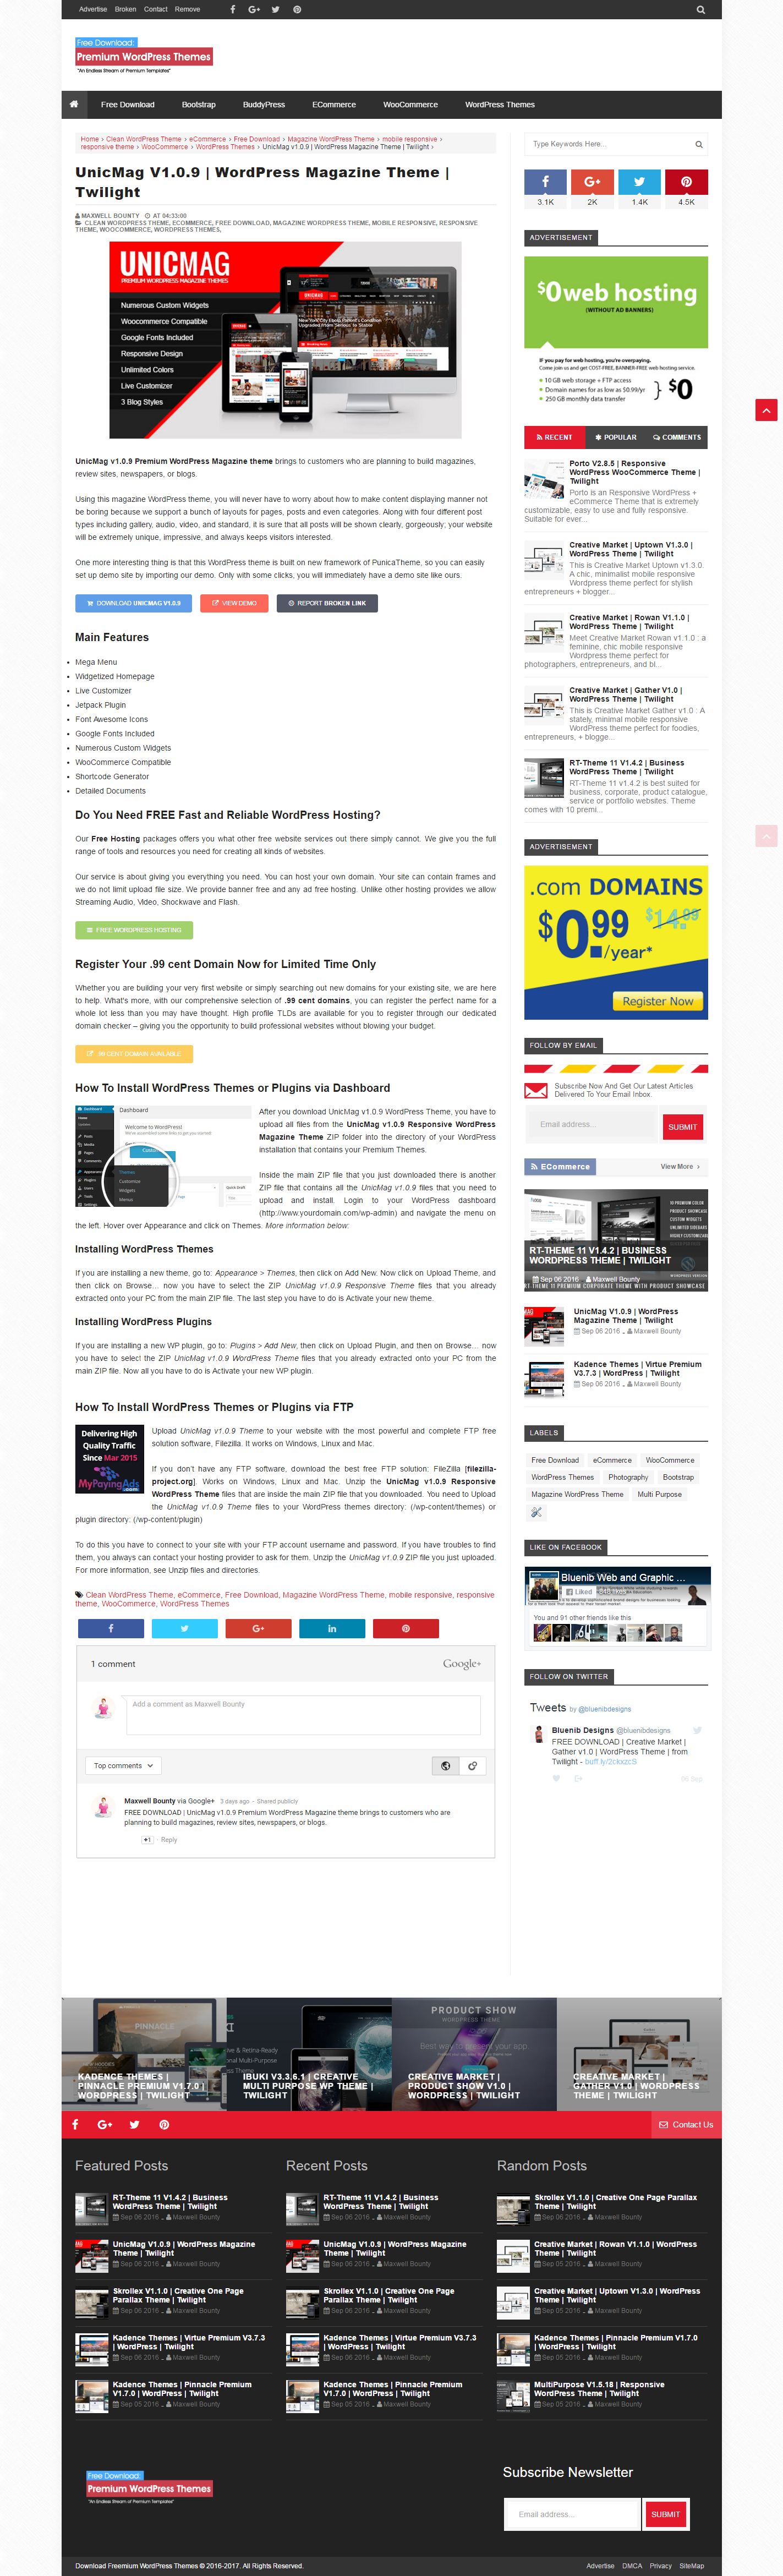 magazine free download sites